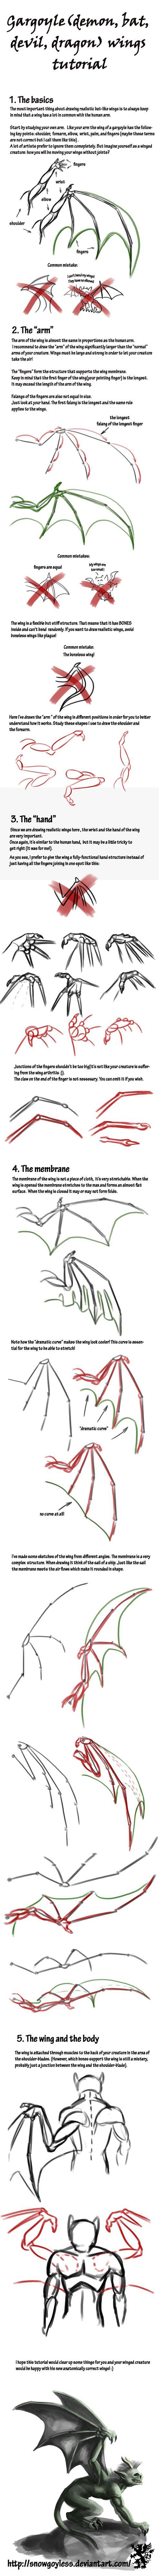 Gargoyle Wings Tutorial by ~Snowgoyless on deviantART https://www.facebook.com/CharacterDesignReferences